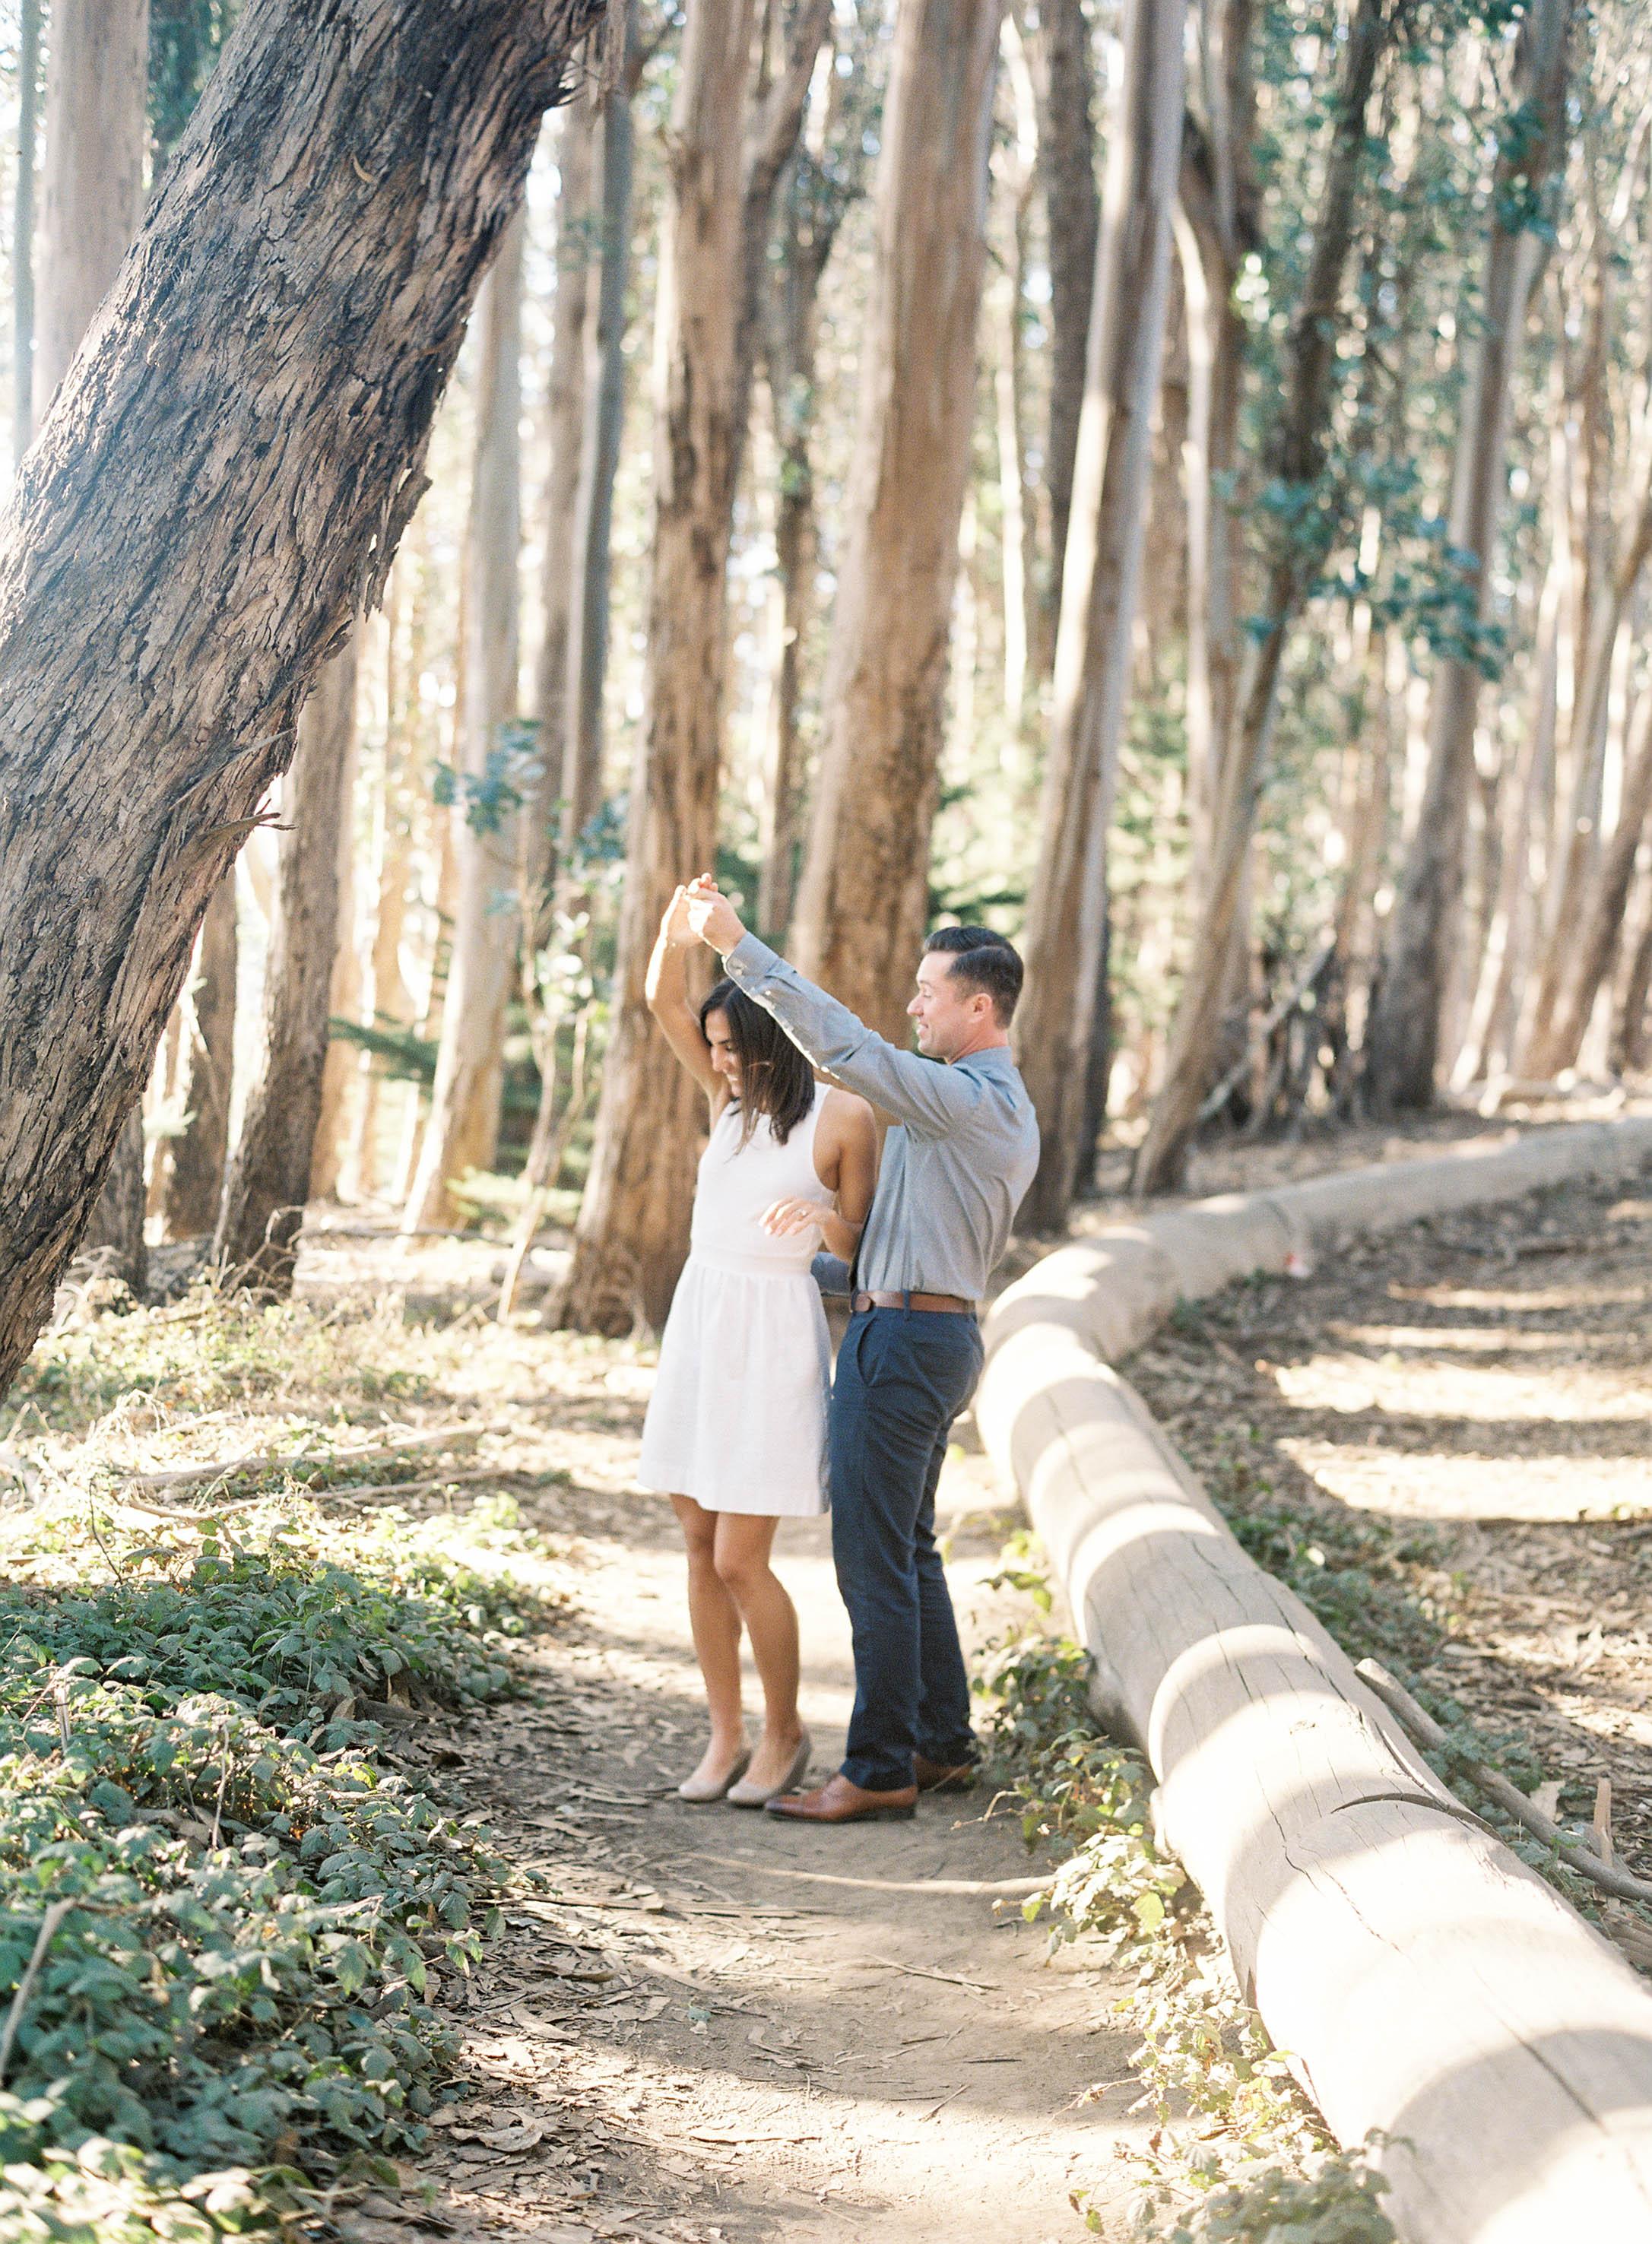 Meghan Mehan Photography - Fine Art Film Photography - California | San Francisco | Napa | Sonoma | Carmel | Big Sur | Santa Barbara | Nashville 024.jpg